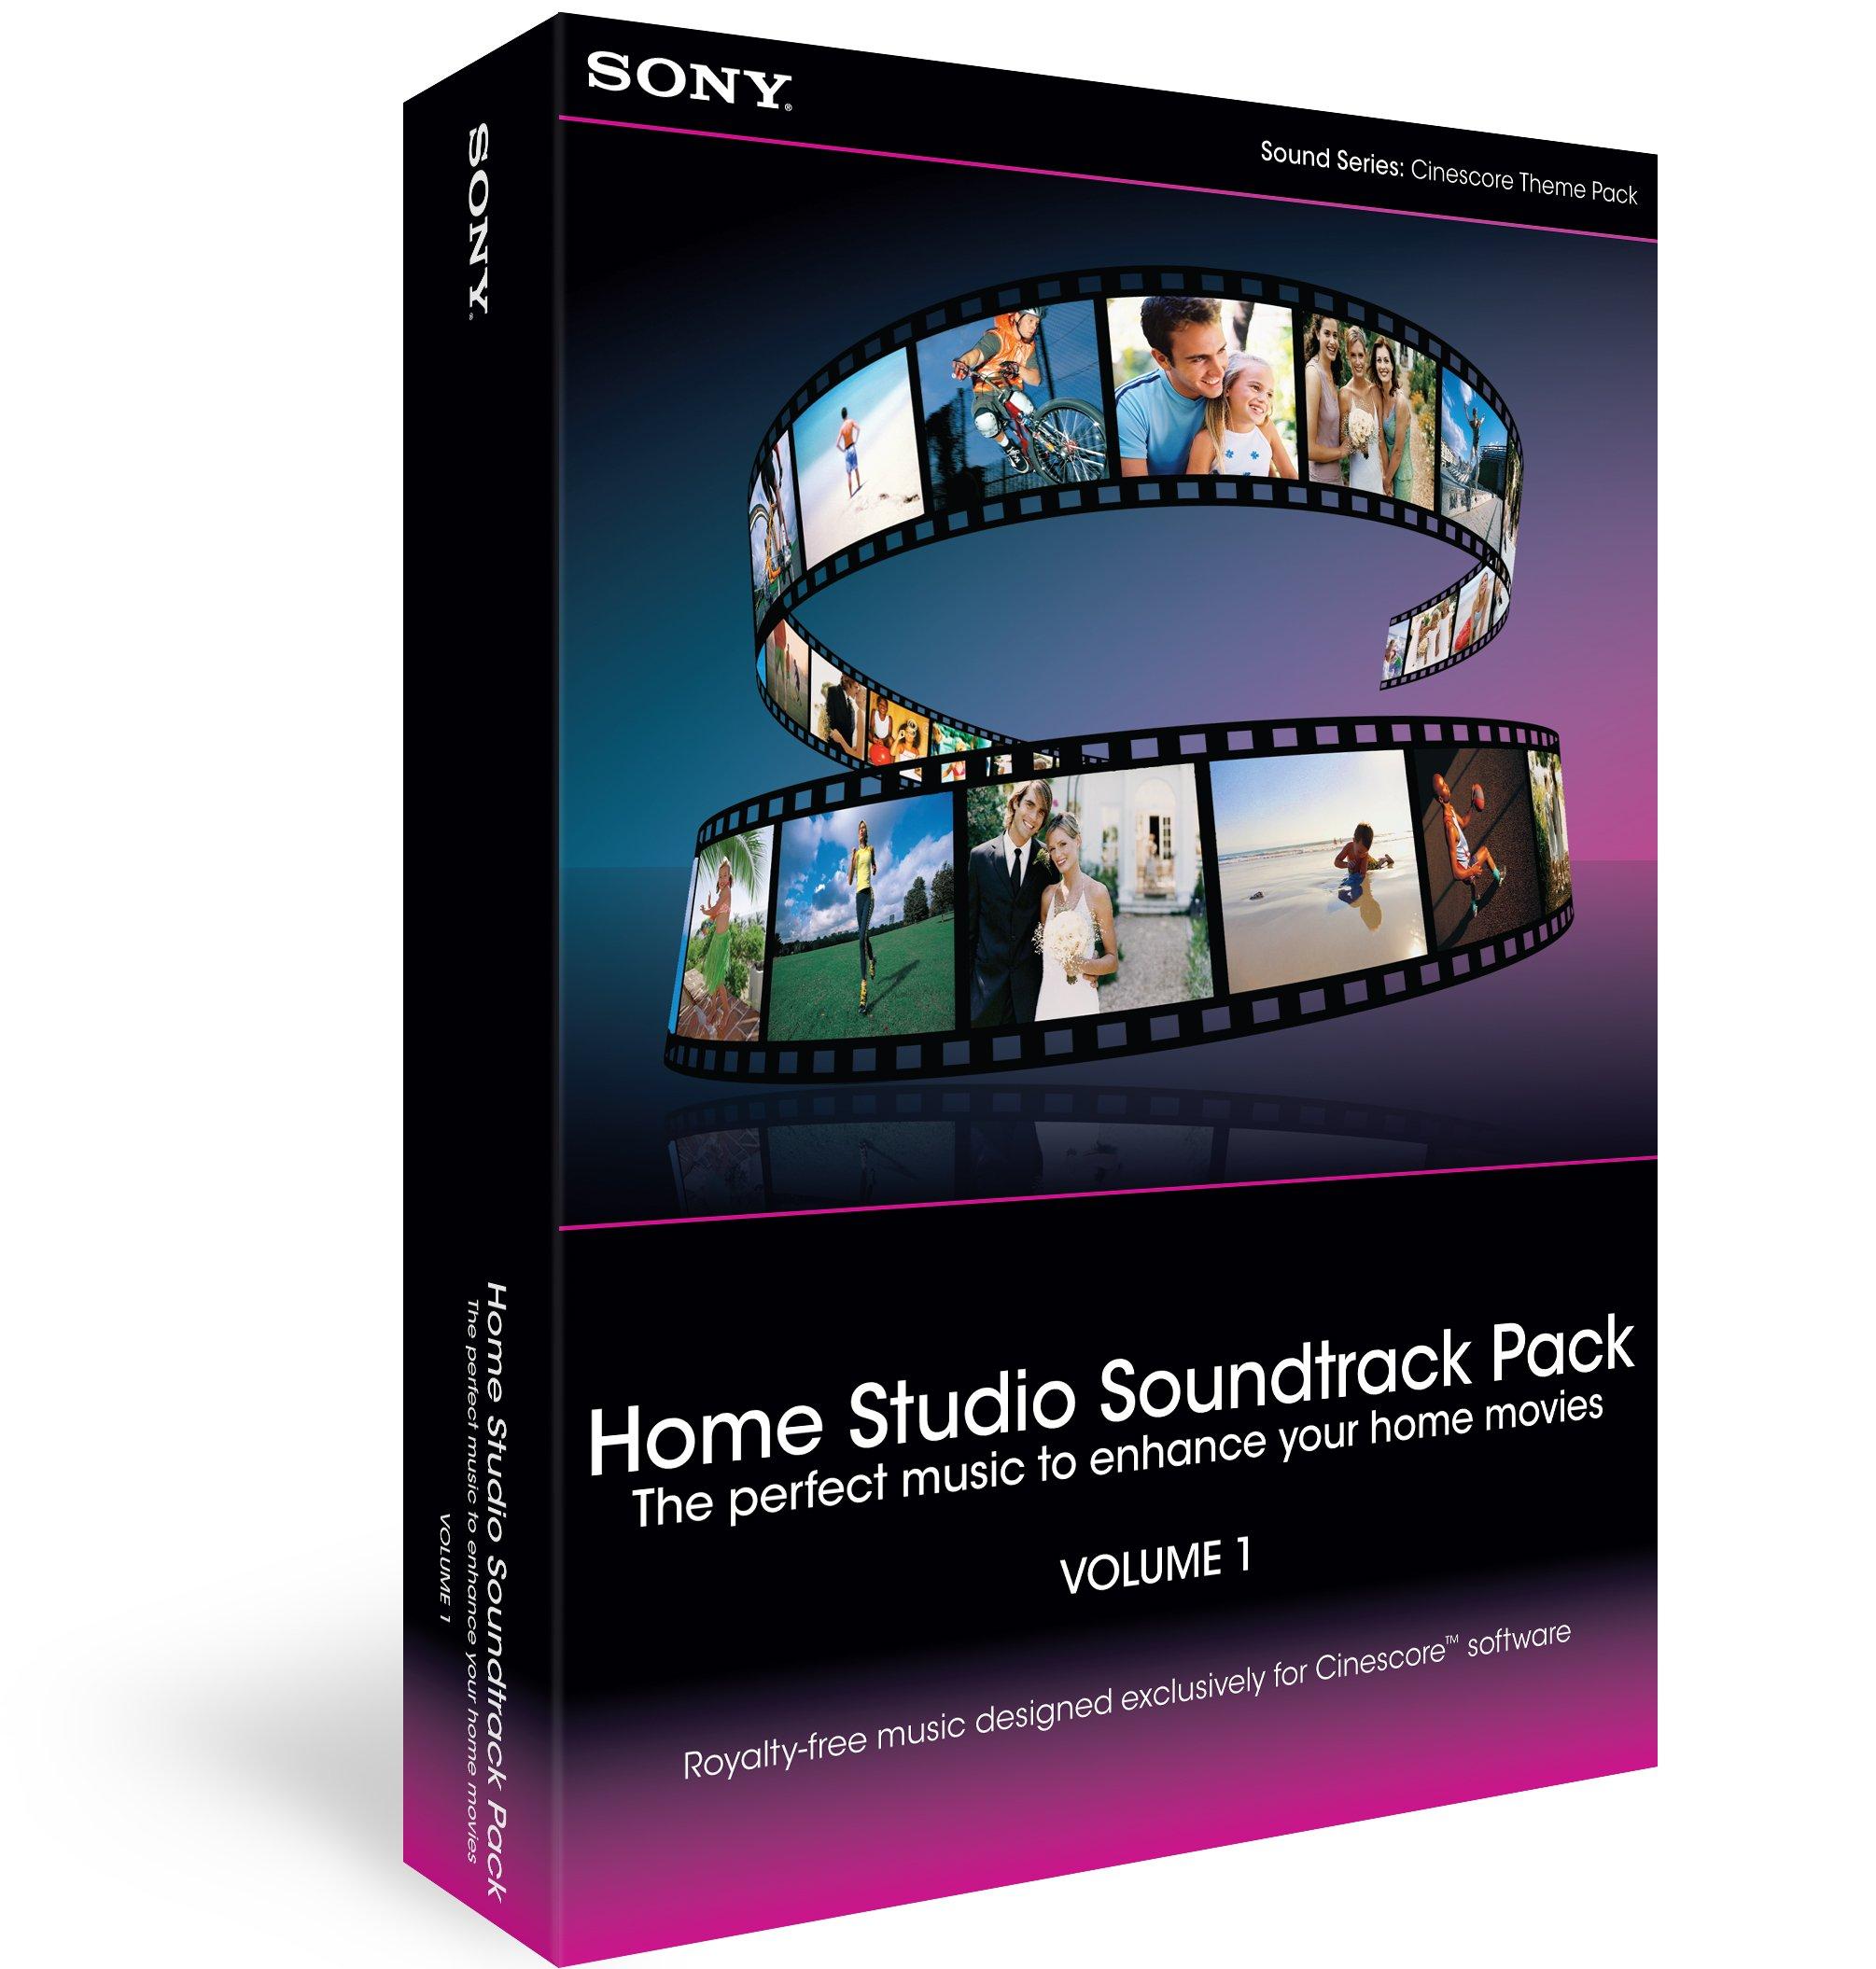 Home Studio Soundtrack Pack, Volume 1